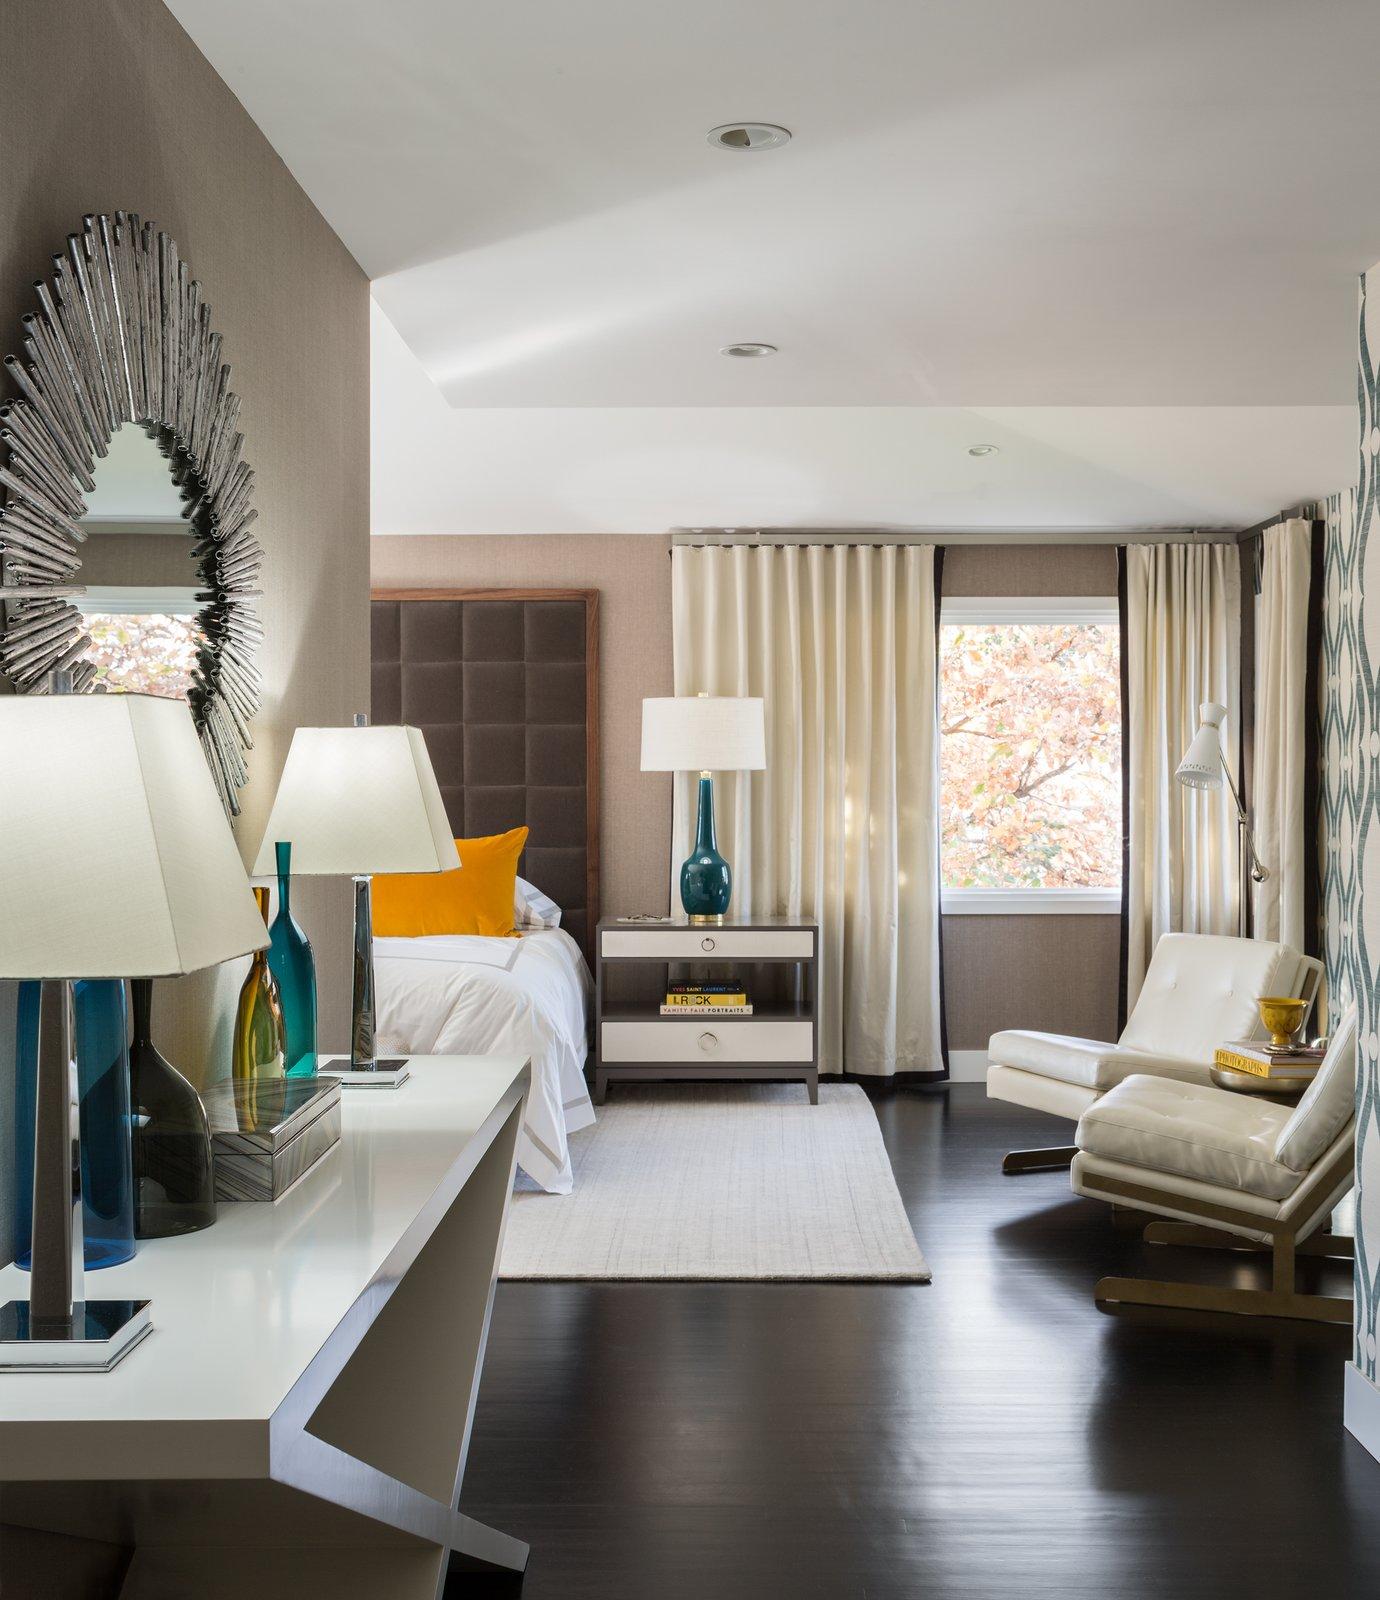 Bedroom, Dresser, Bed, Chair, Ceiling Lighting, and Dark Hardwood Floor Master Bedroom  Donner Residence by Design Platform